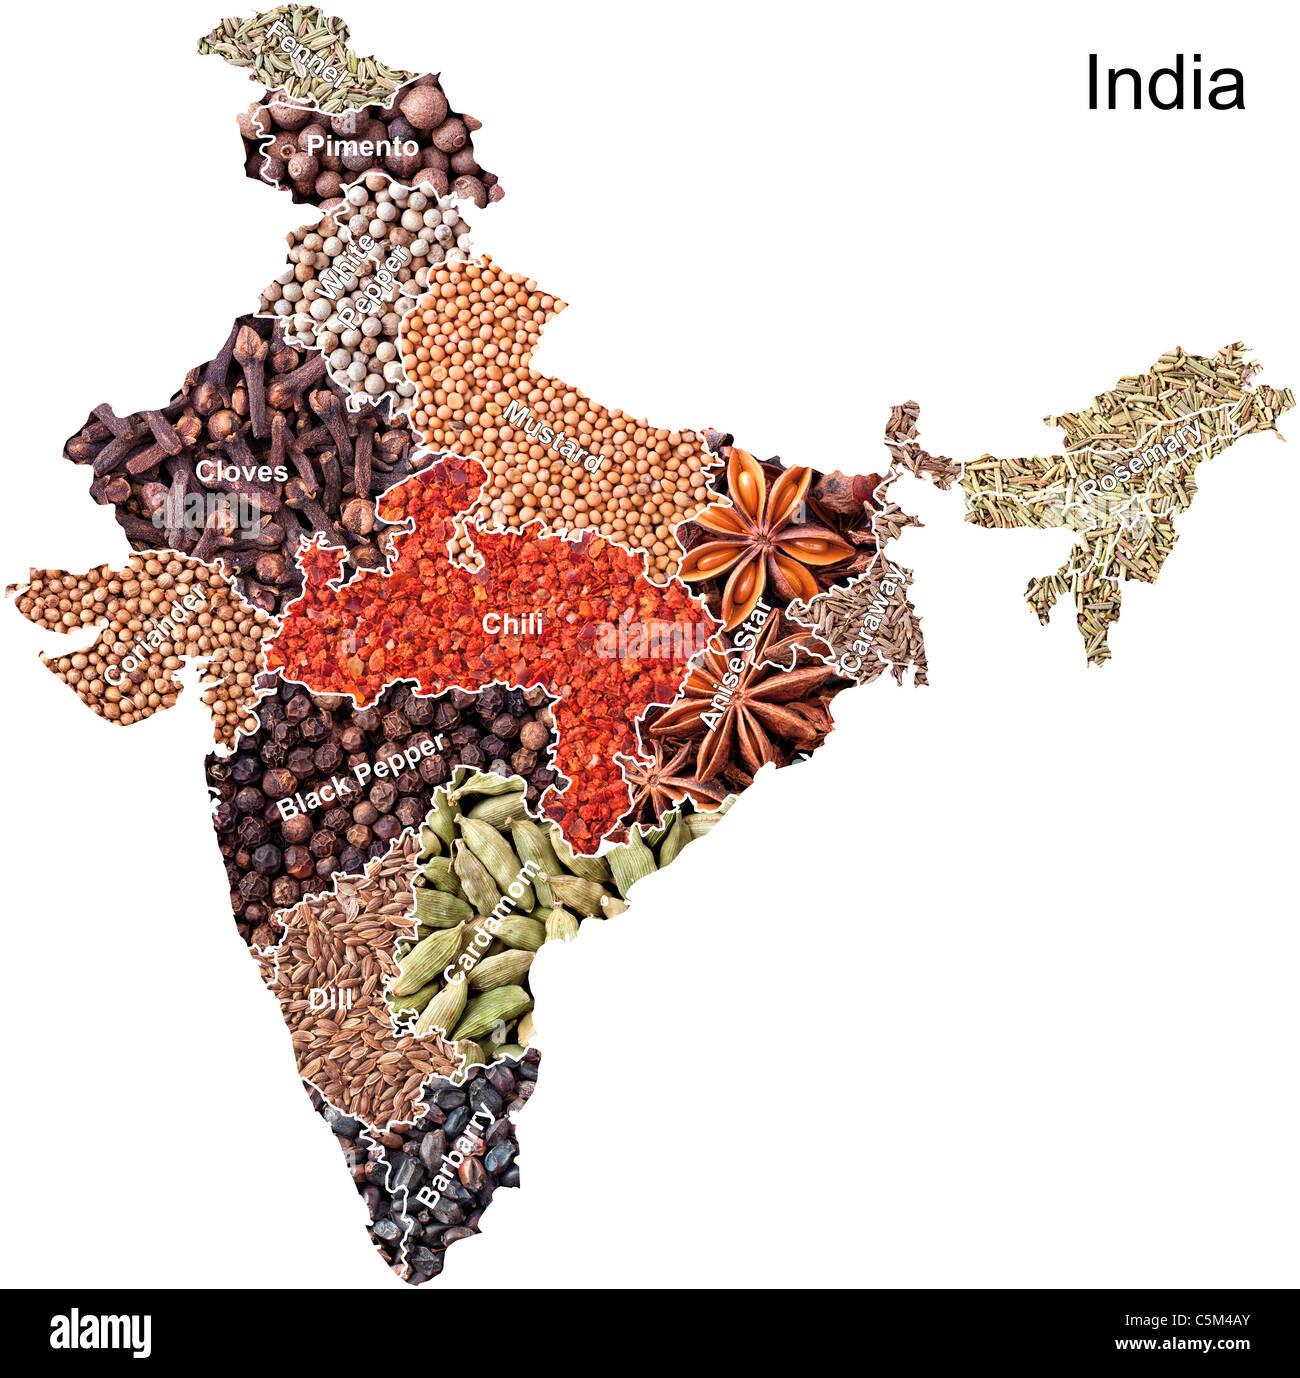 India Political Map Stock Photos & India Political Map Stock Images ...